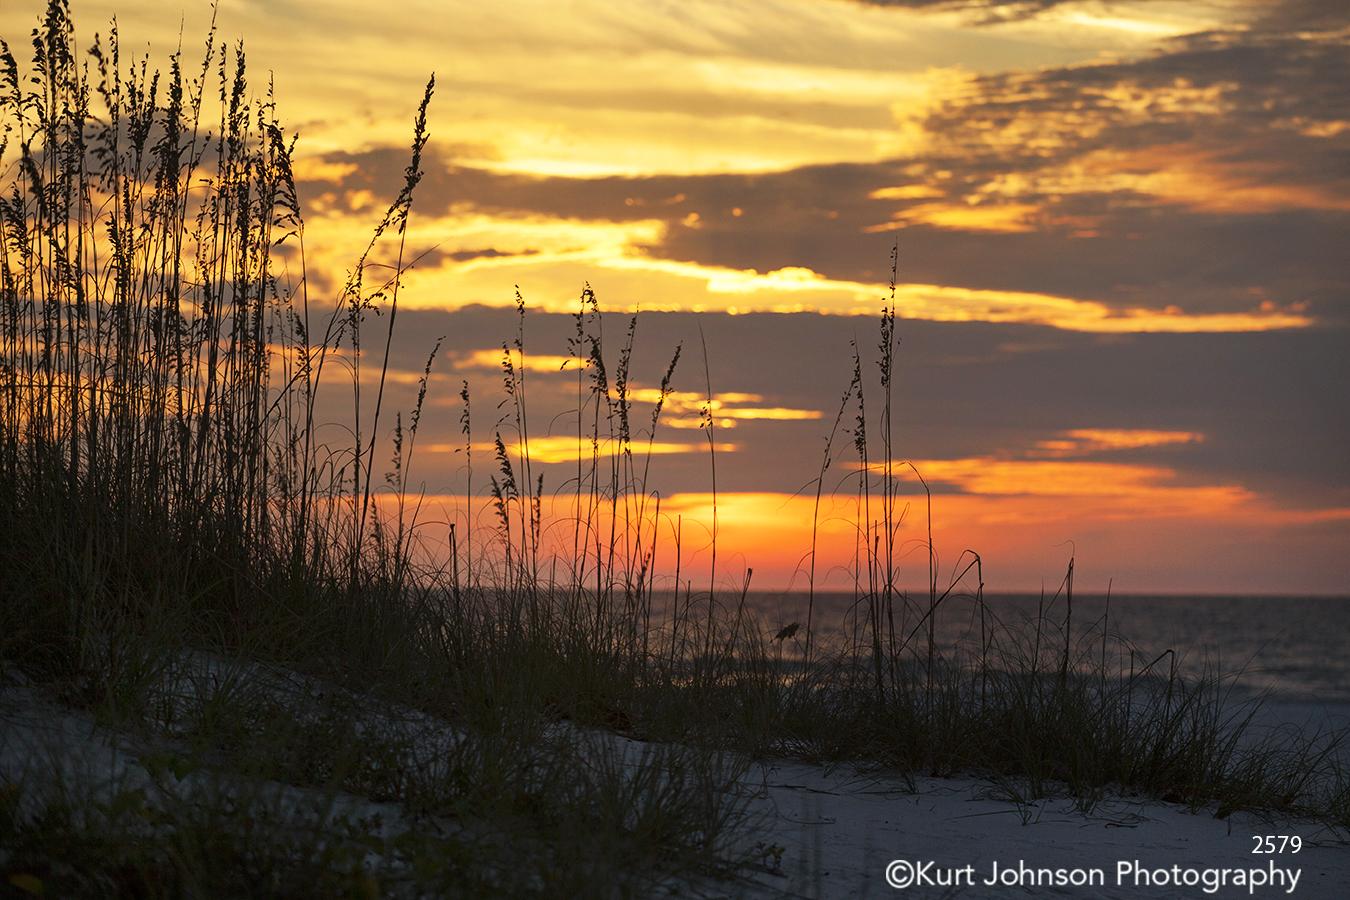 orange sunset tall grass waterscape southeast clouds water beach shore